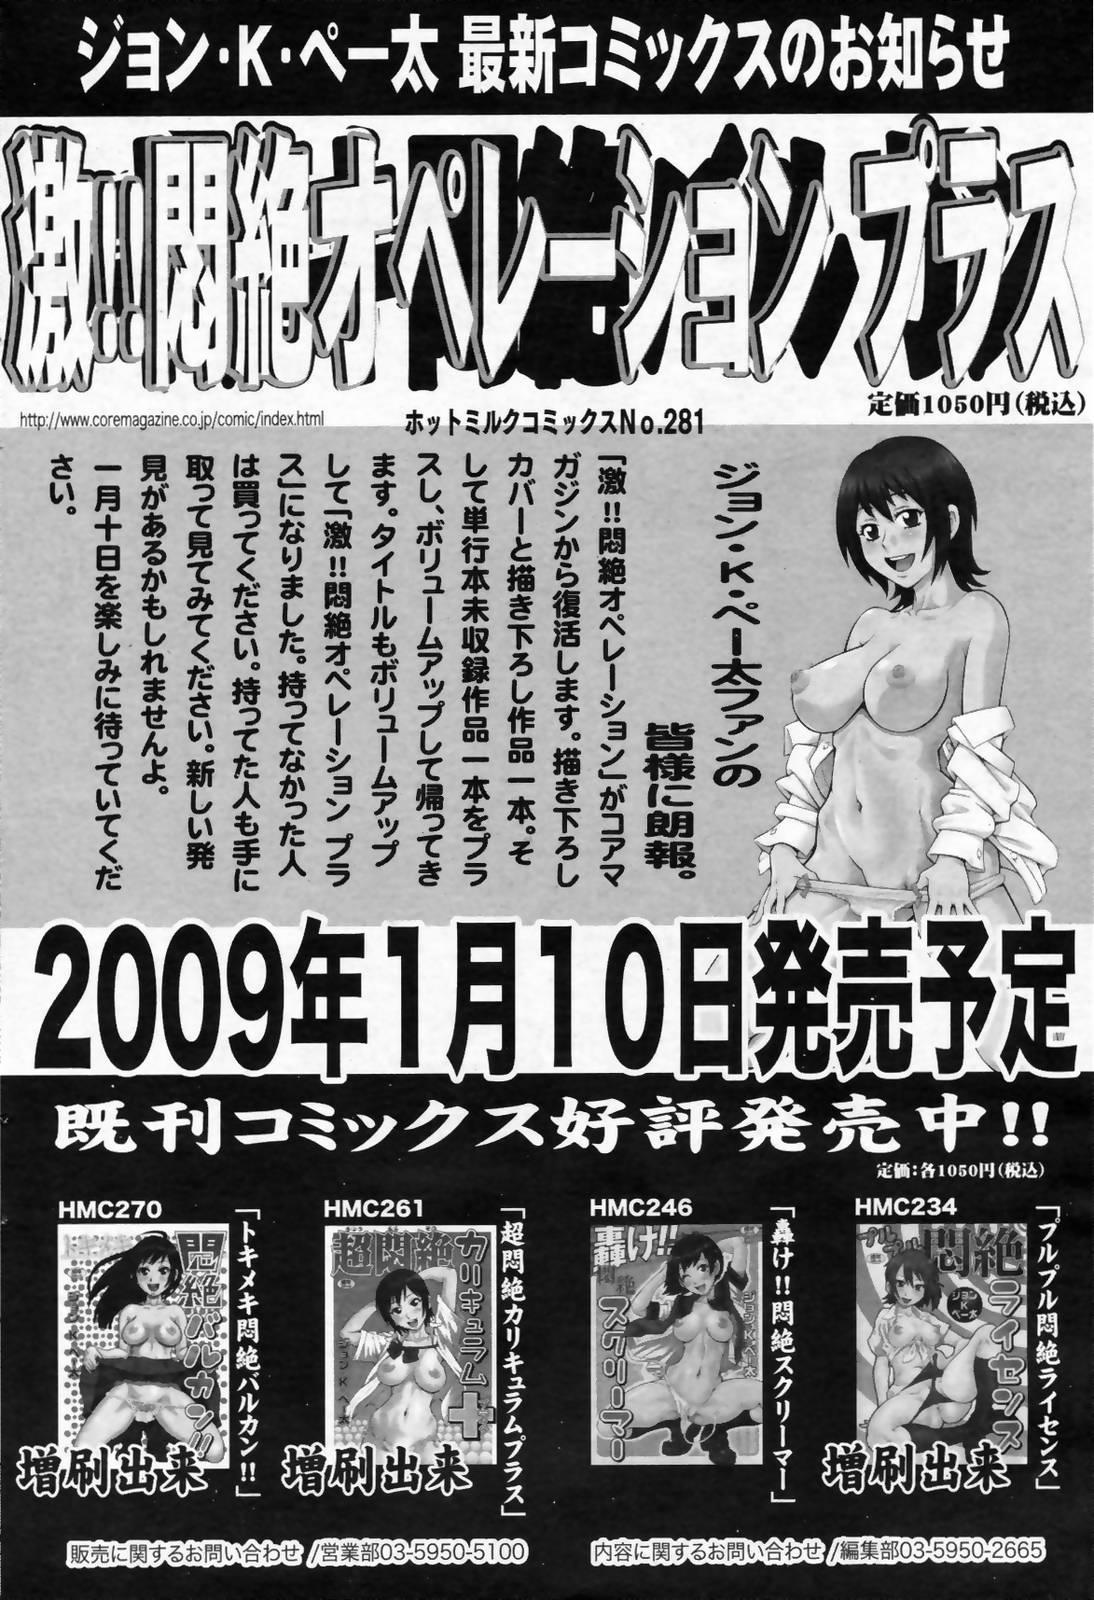 Manga Bangaichi 2009-02 Vol. 234 99